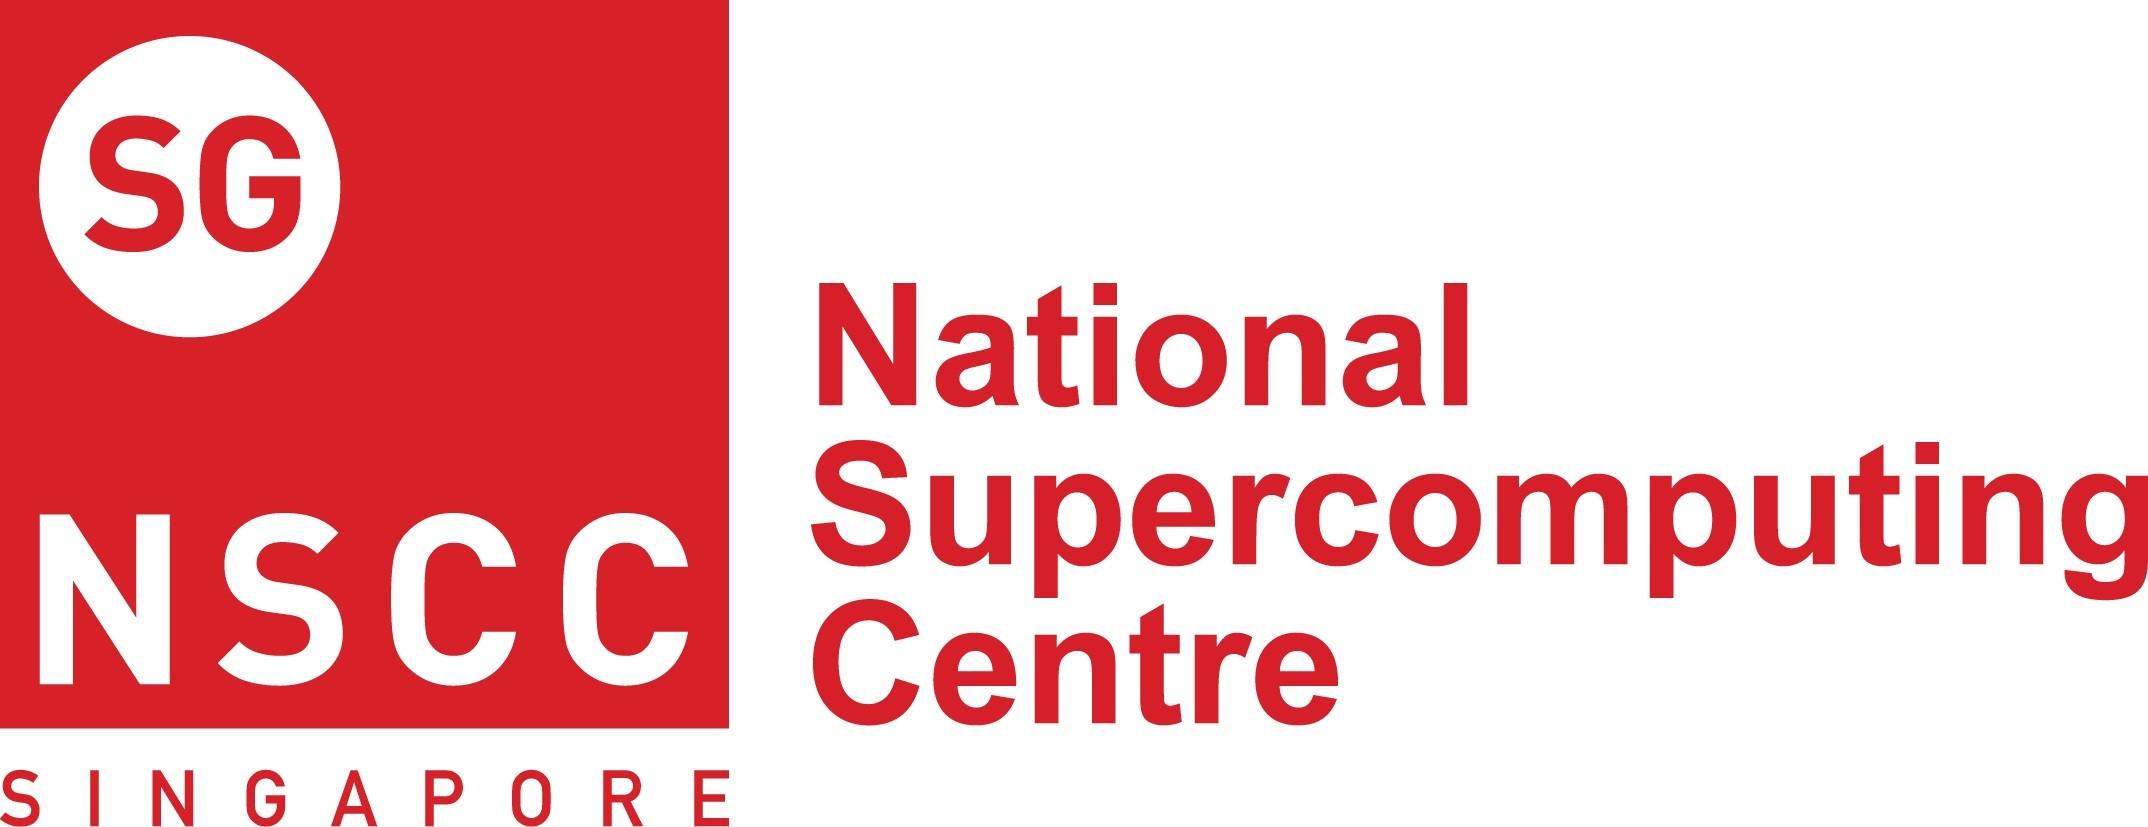 National Supercomputing Centre (NSCC)